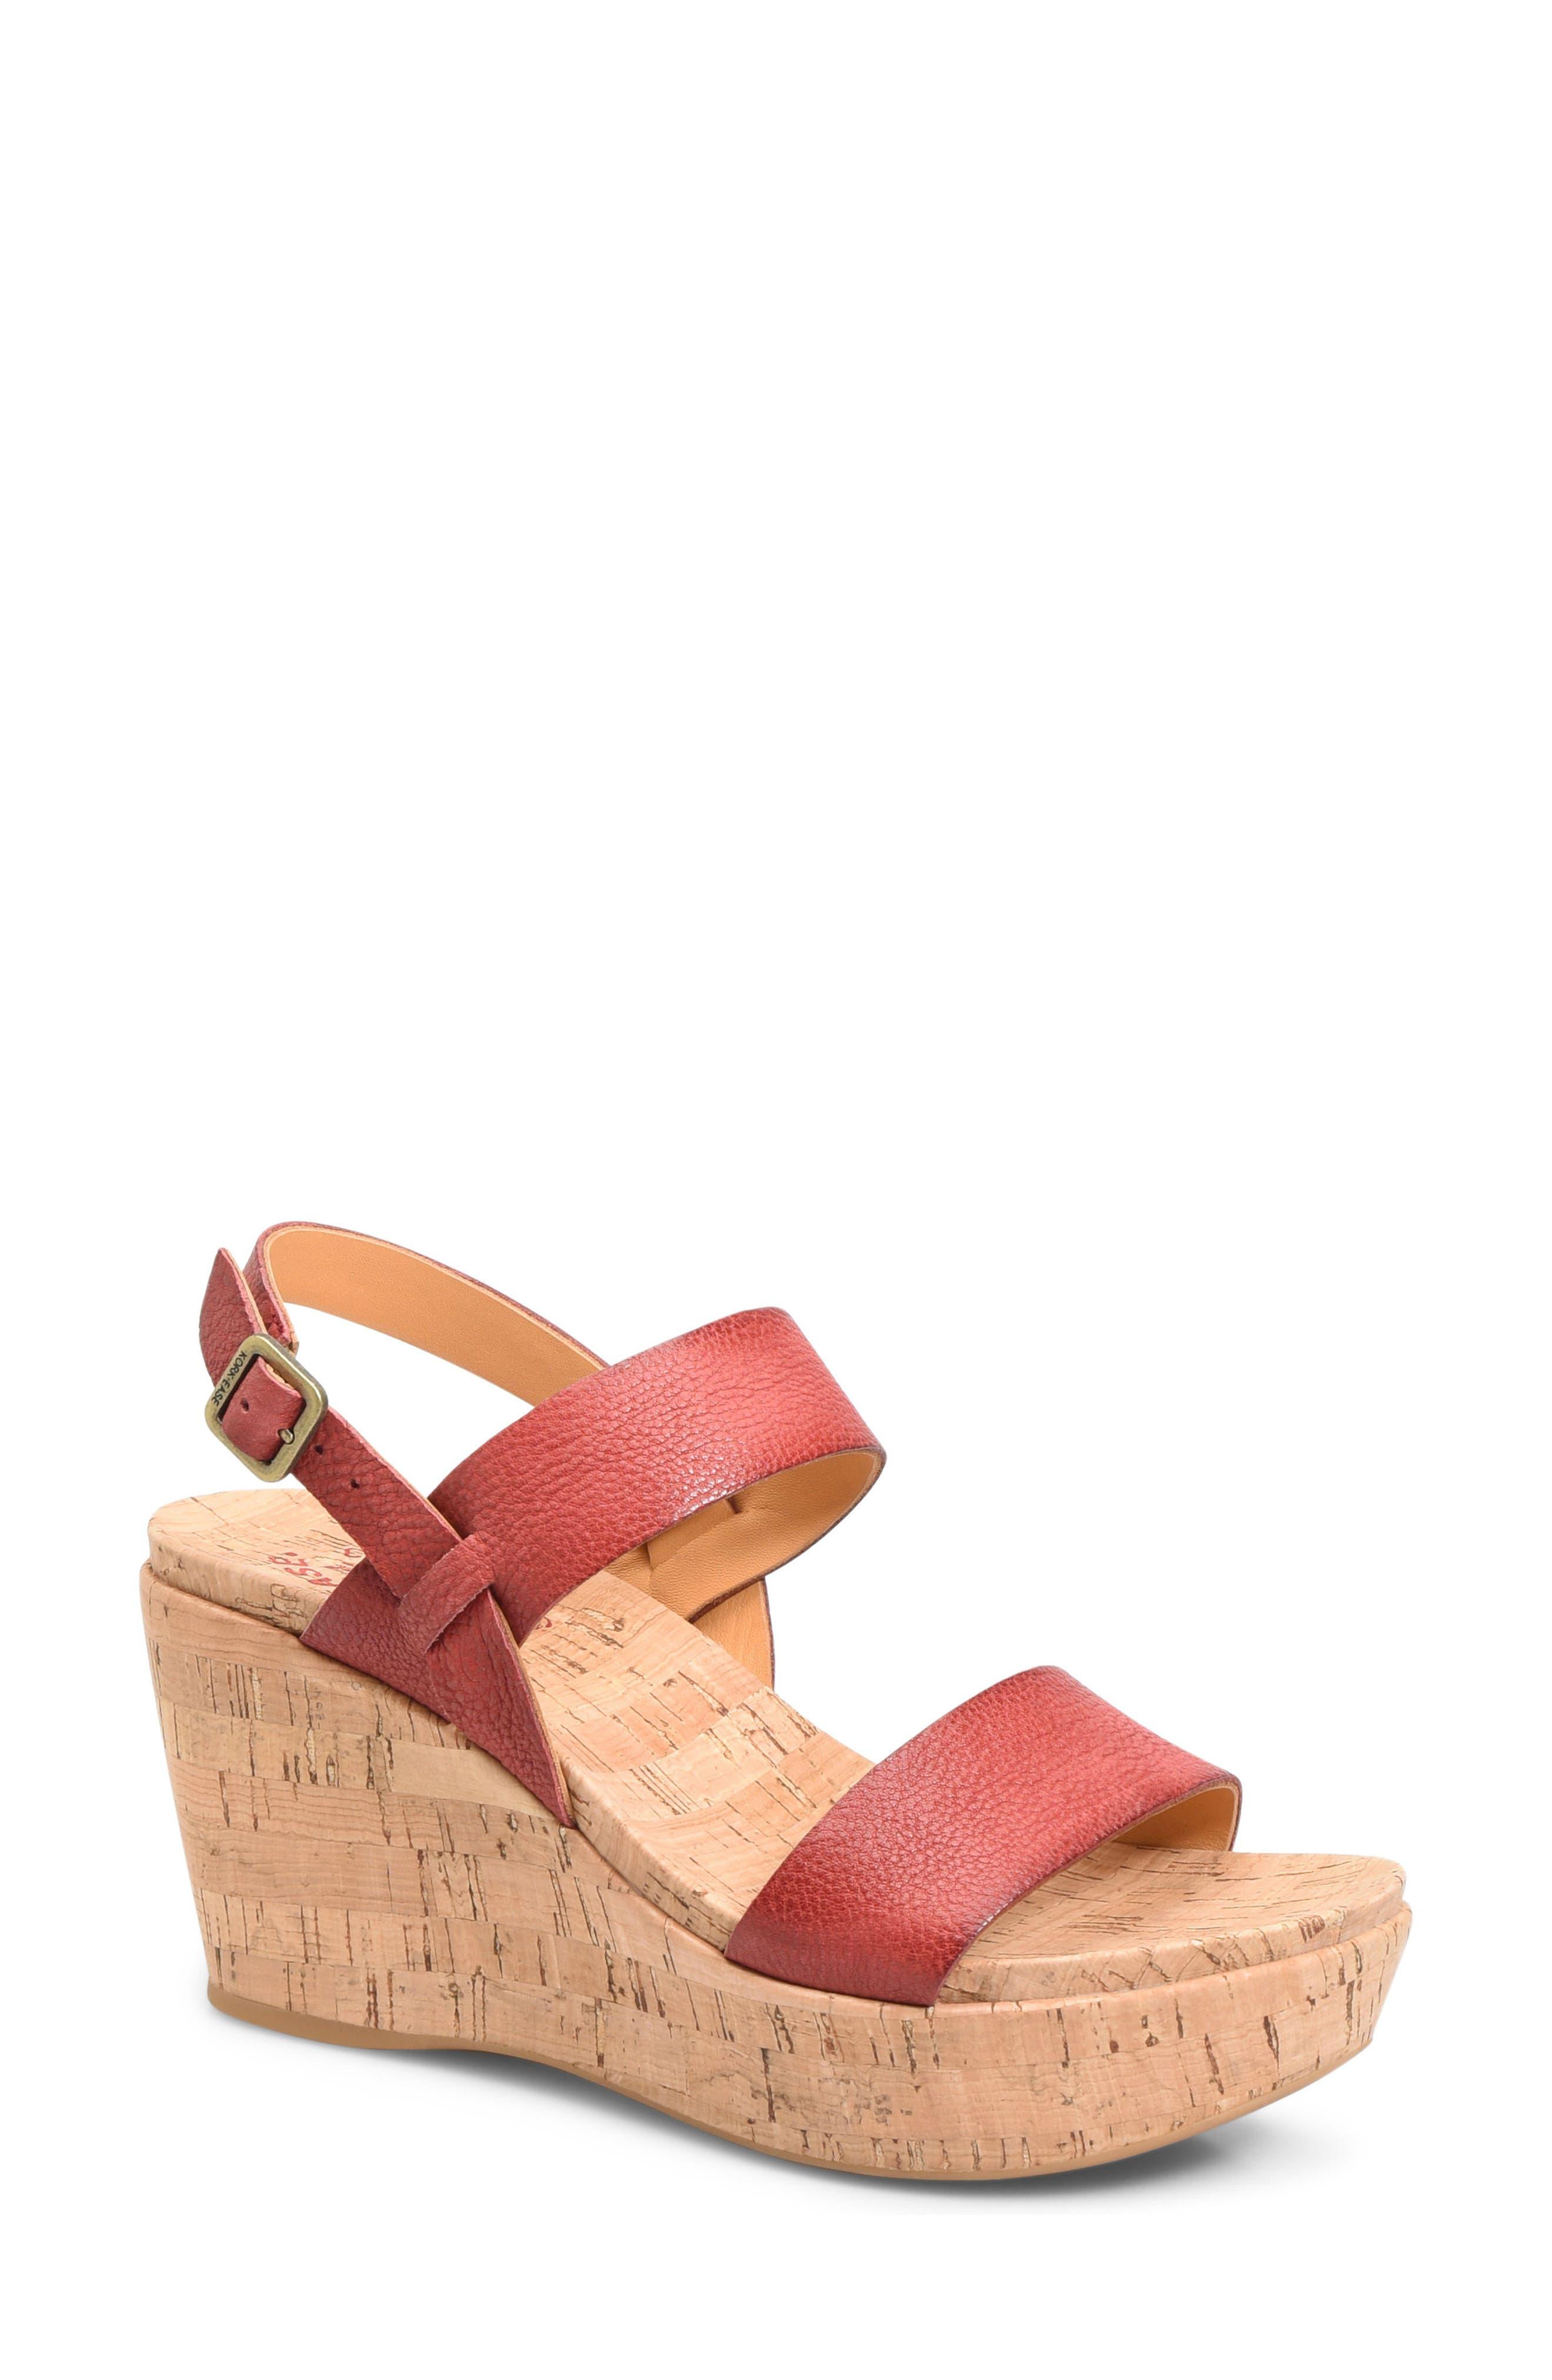 'Austin' Slingback Wedge Sandal,                             Main thumbnail 9, color,